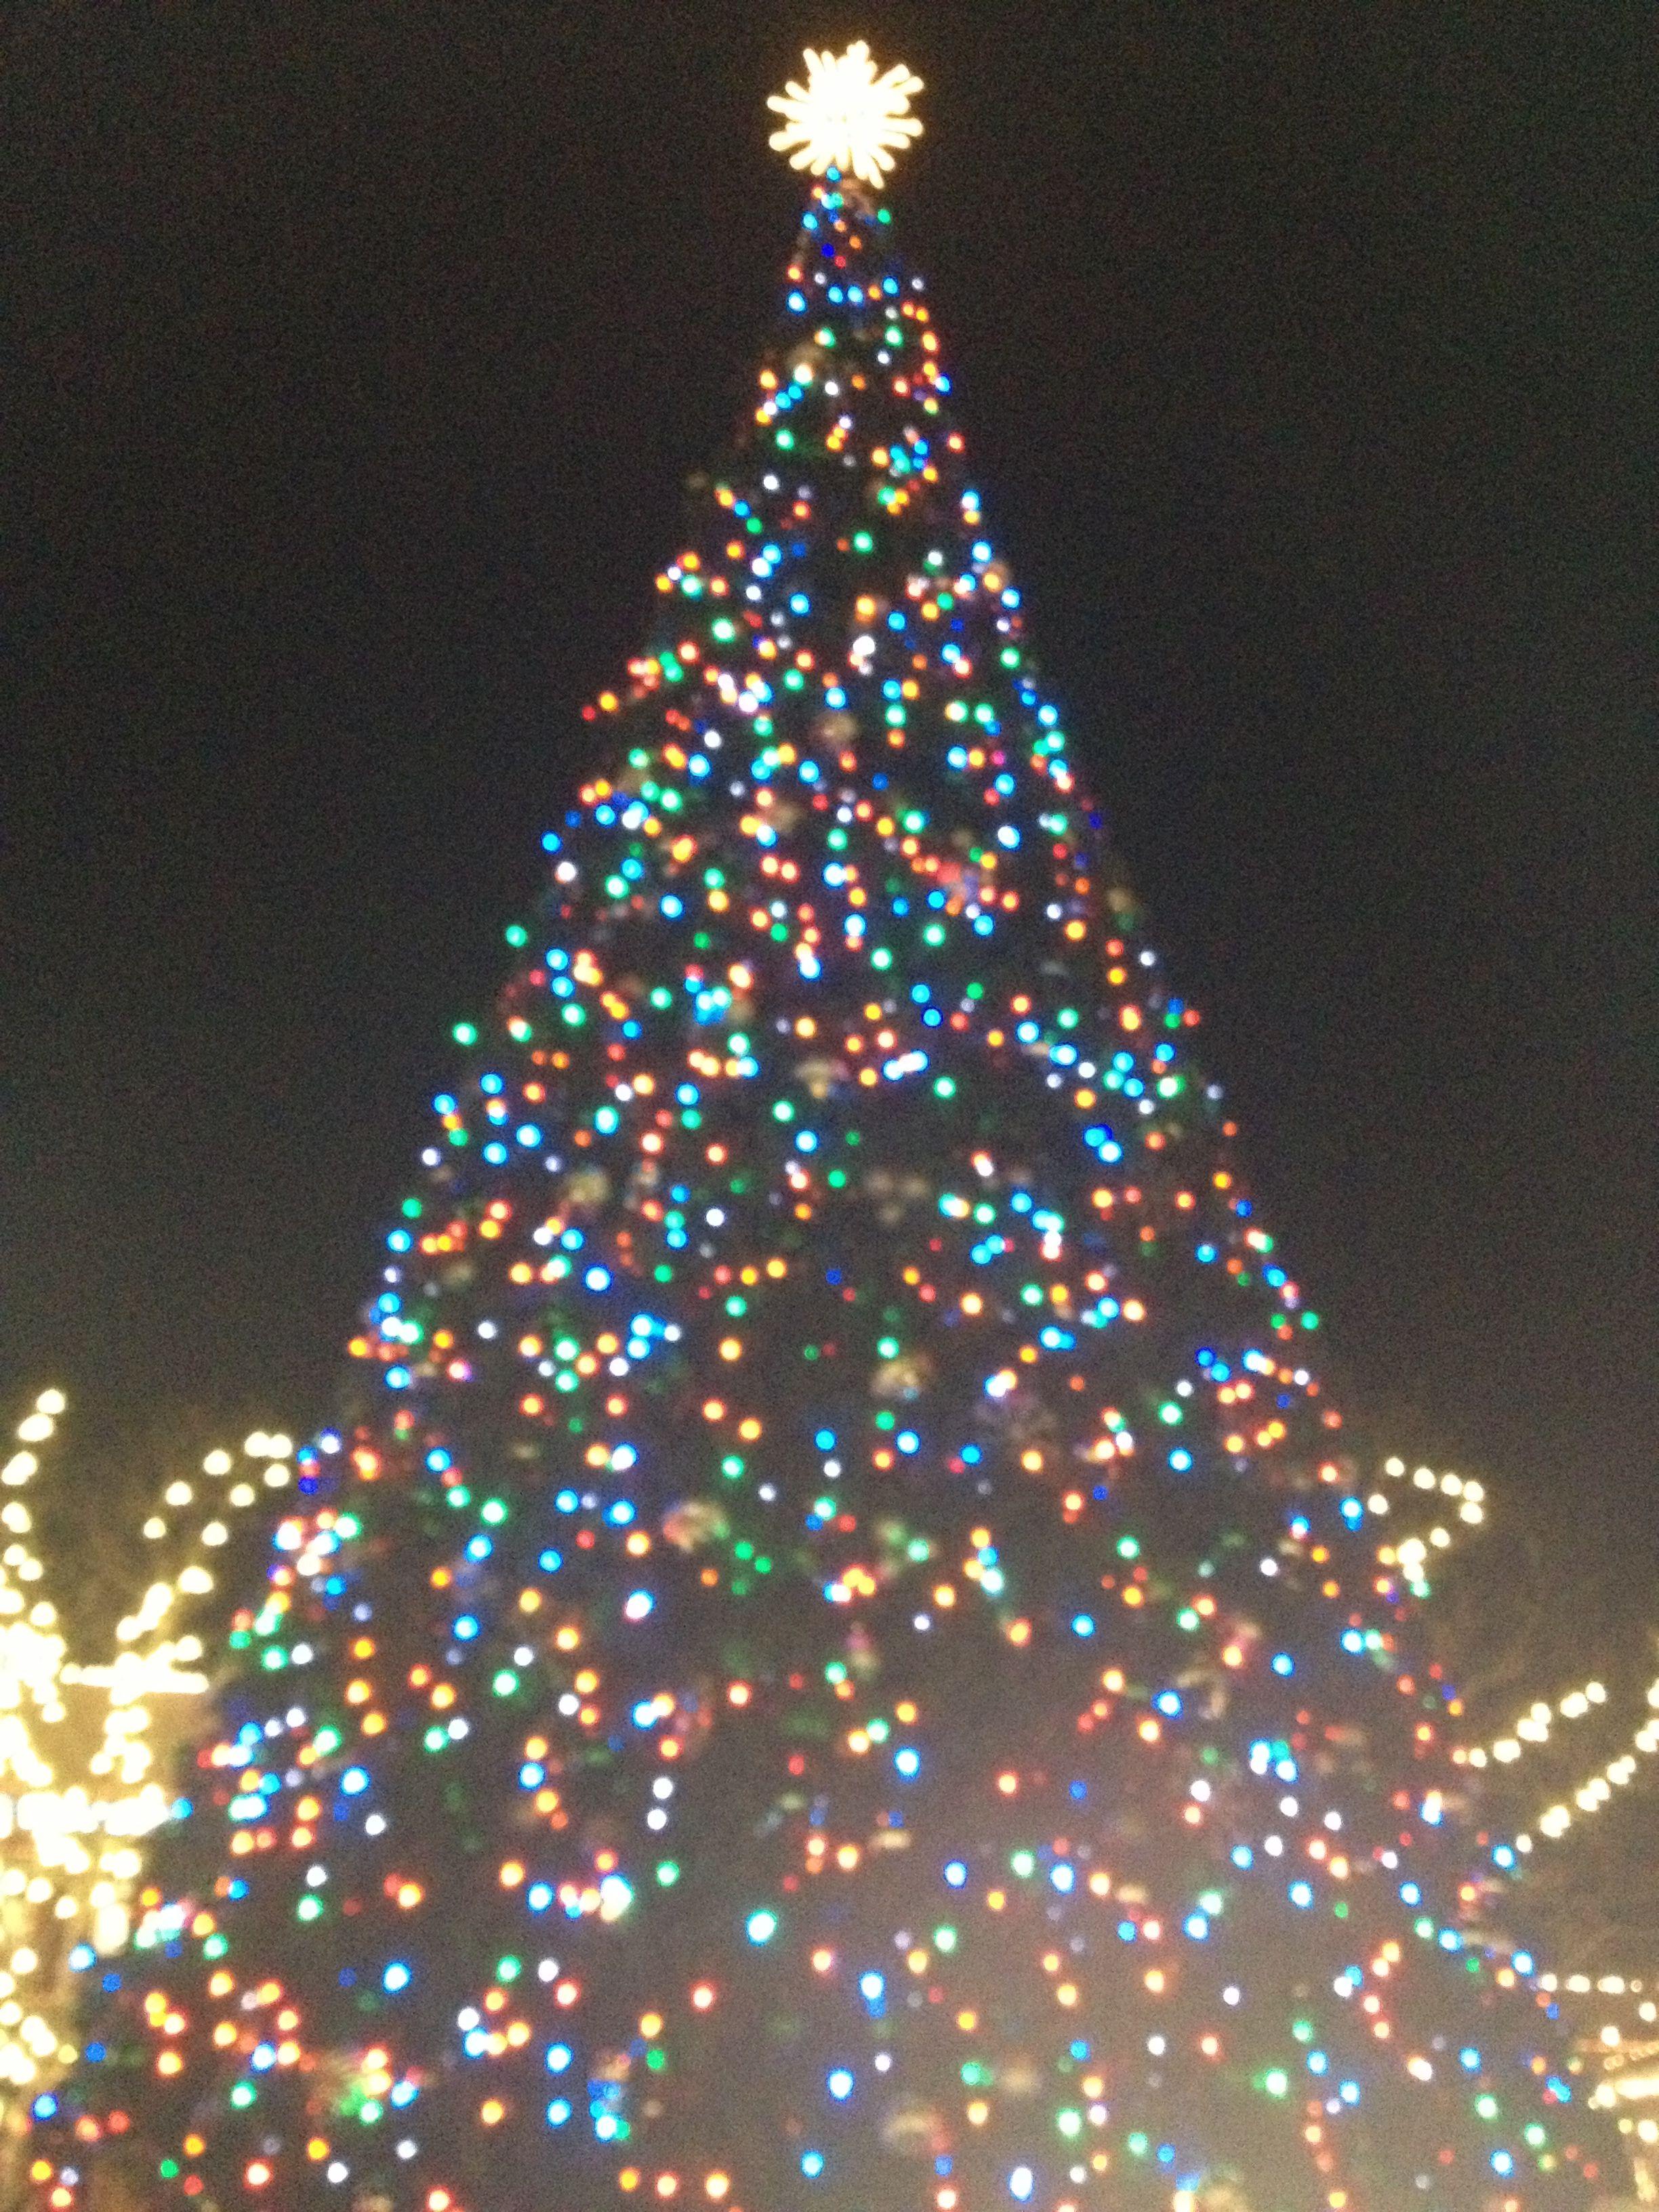 Christmas Tree At Easton In Columbus Ohio Christmas Bulbs Christmas Ornaments Christmas Pictures